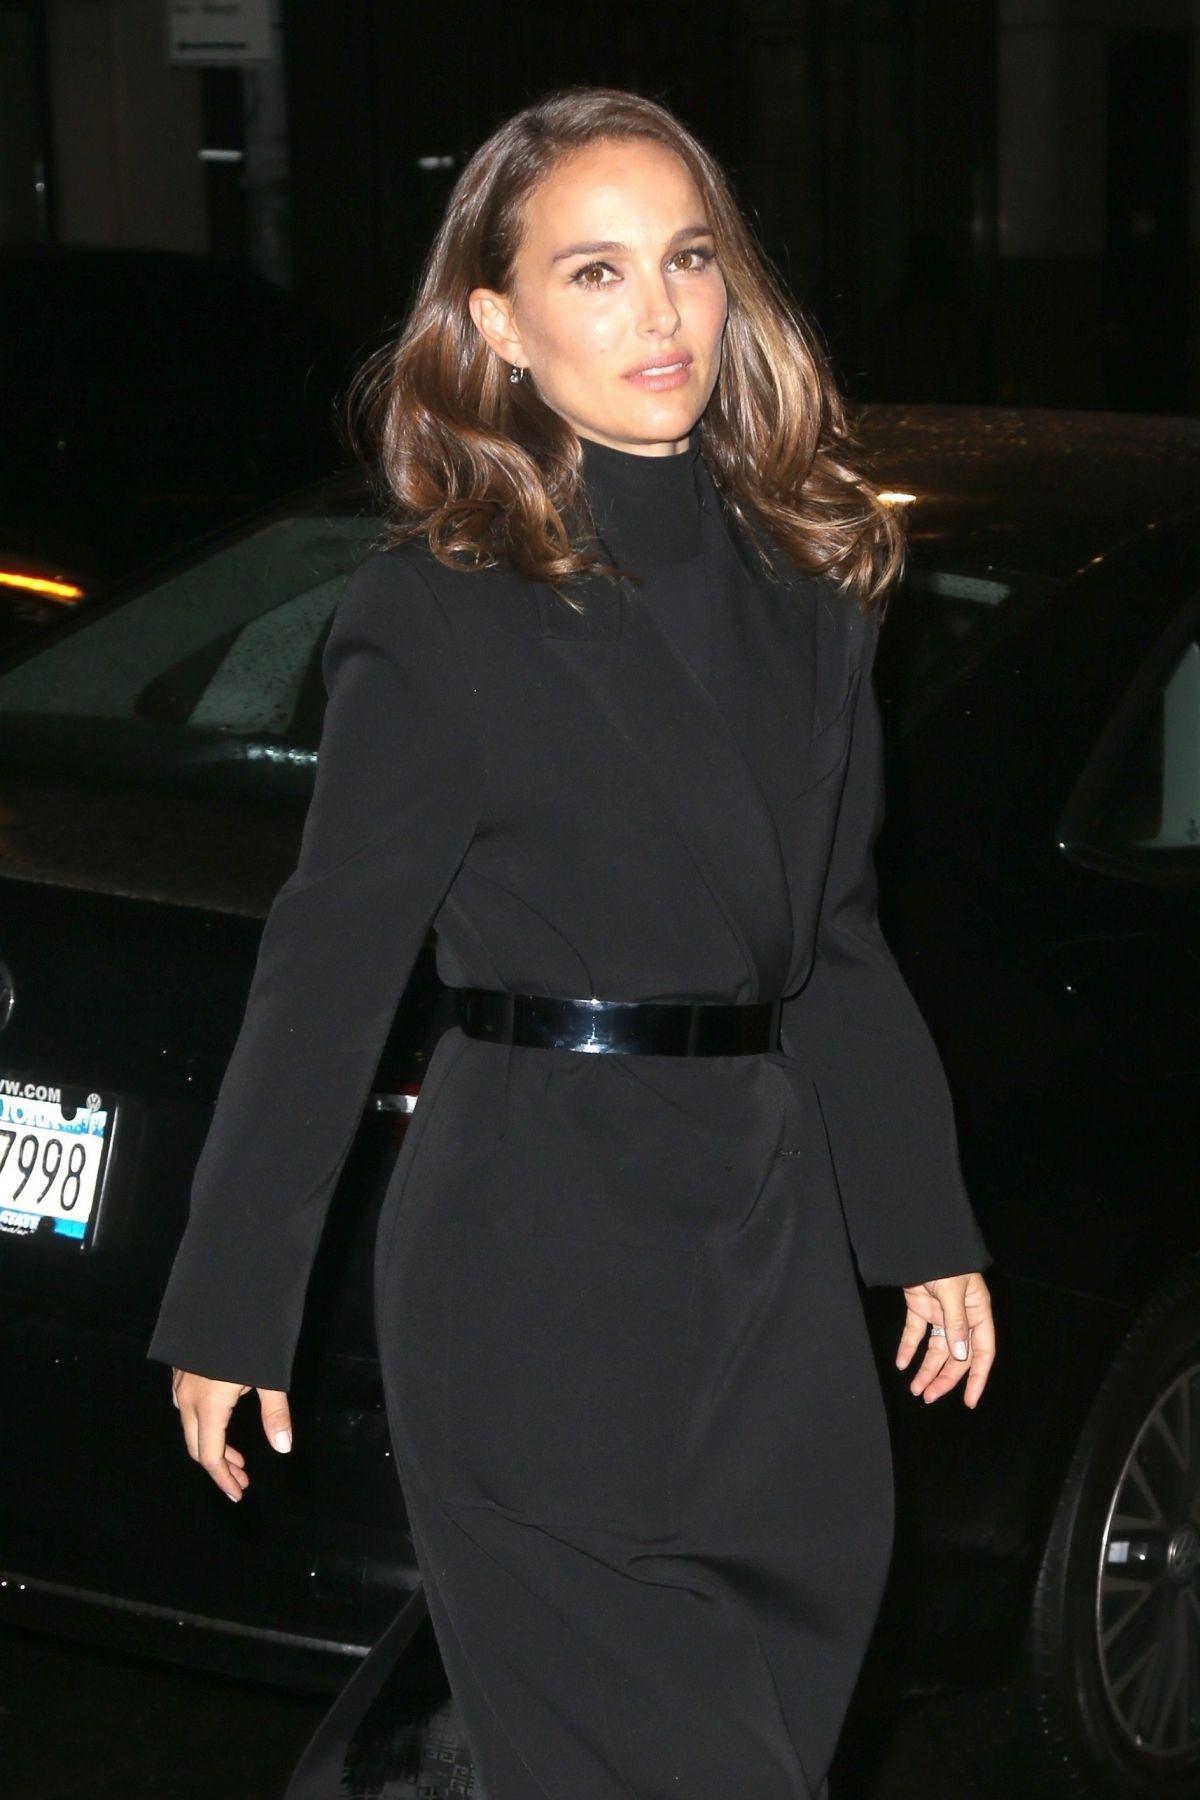 Natalie Night